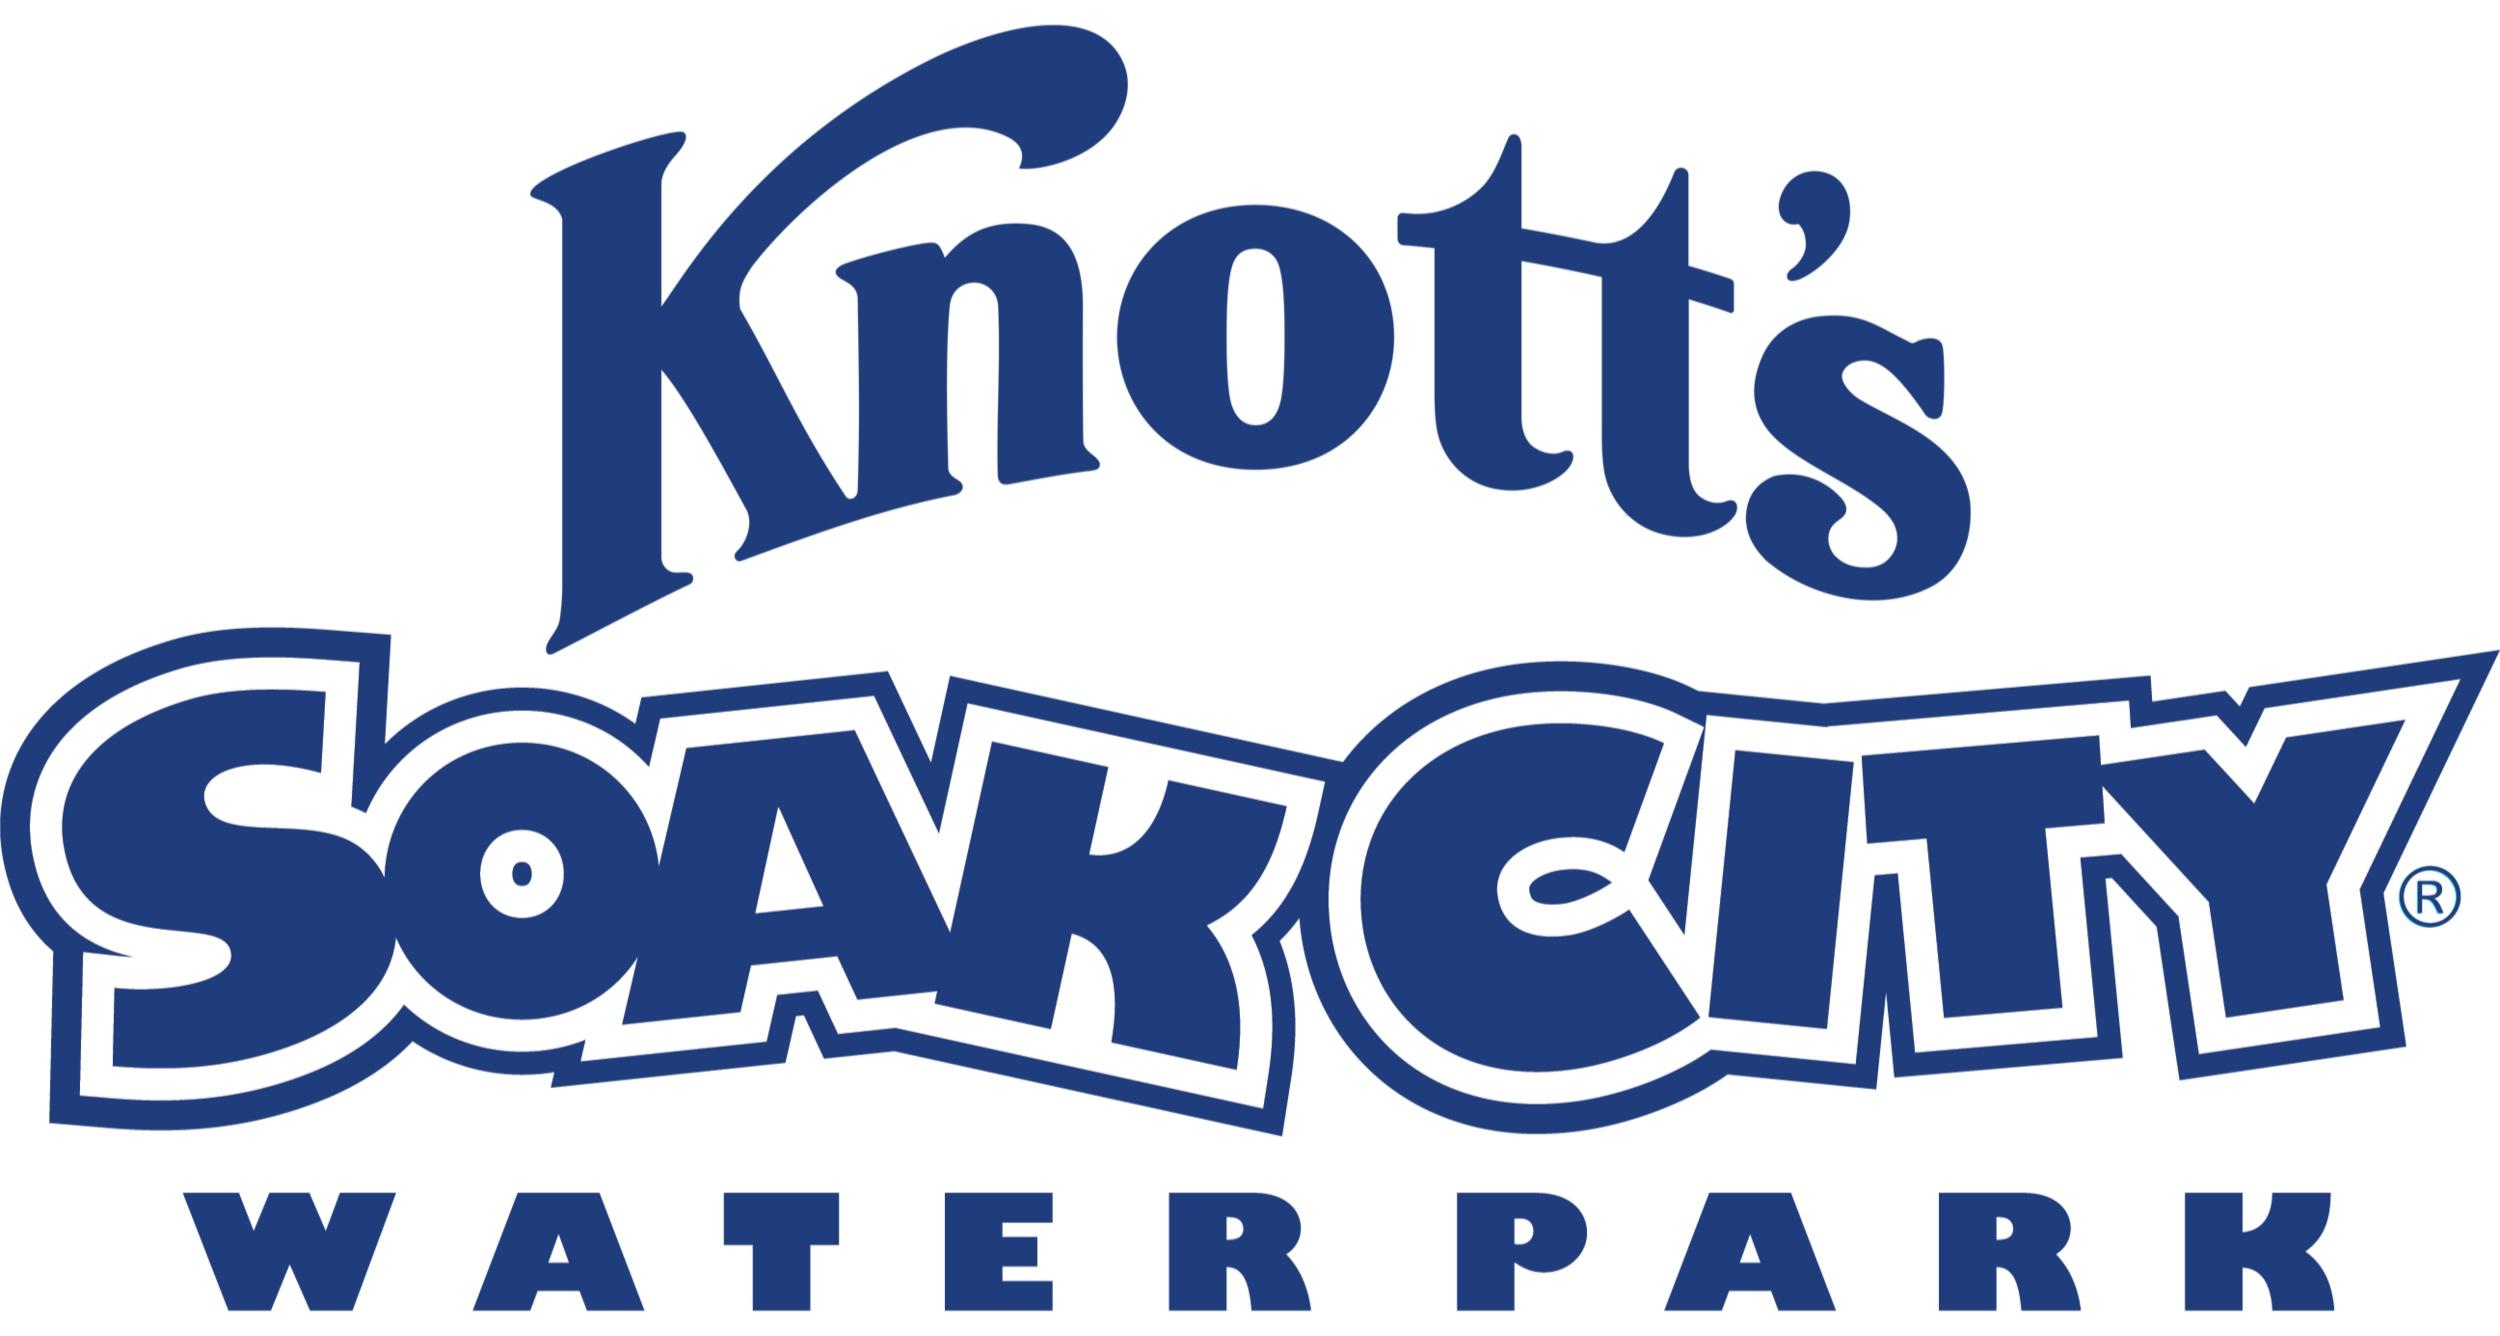 Knotts+Soak+City+Logo.jpg